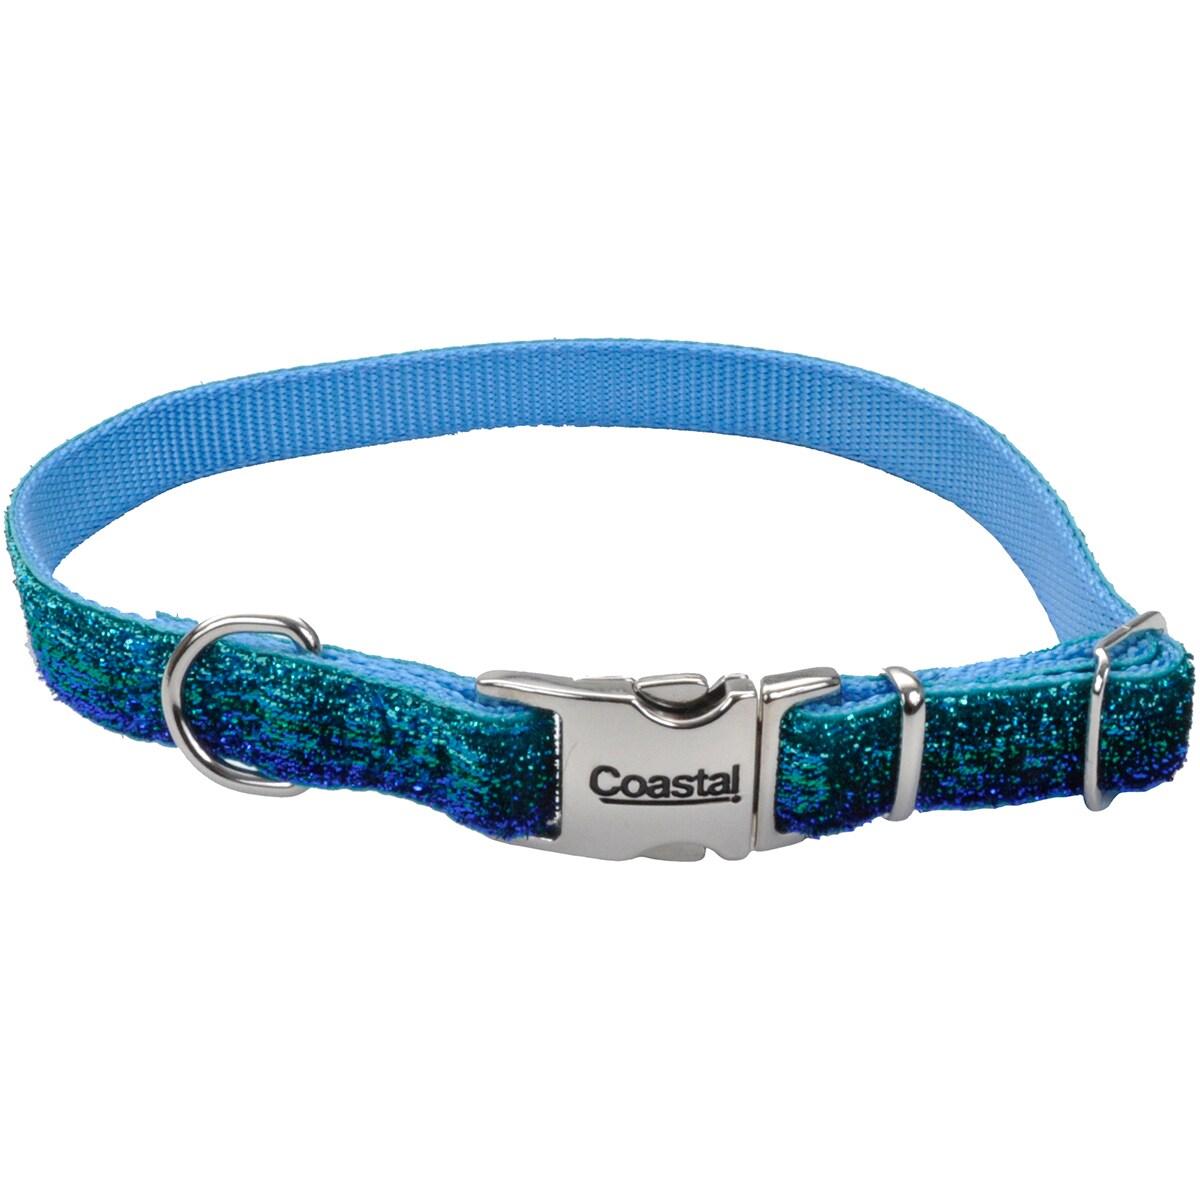 Pet Attire Sparkles Adjustable Dog Collar W/Metal Buckle-5/8, Neck Size 8-12 (Pink)